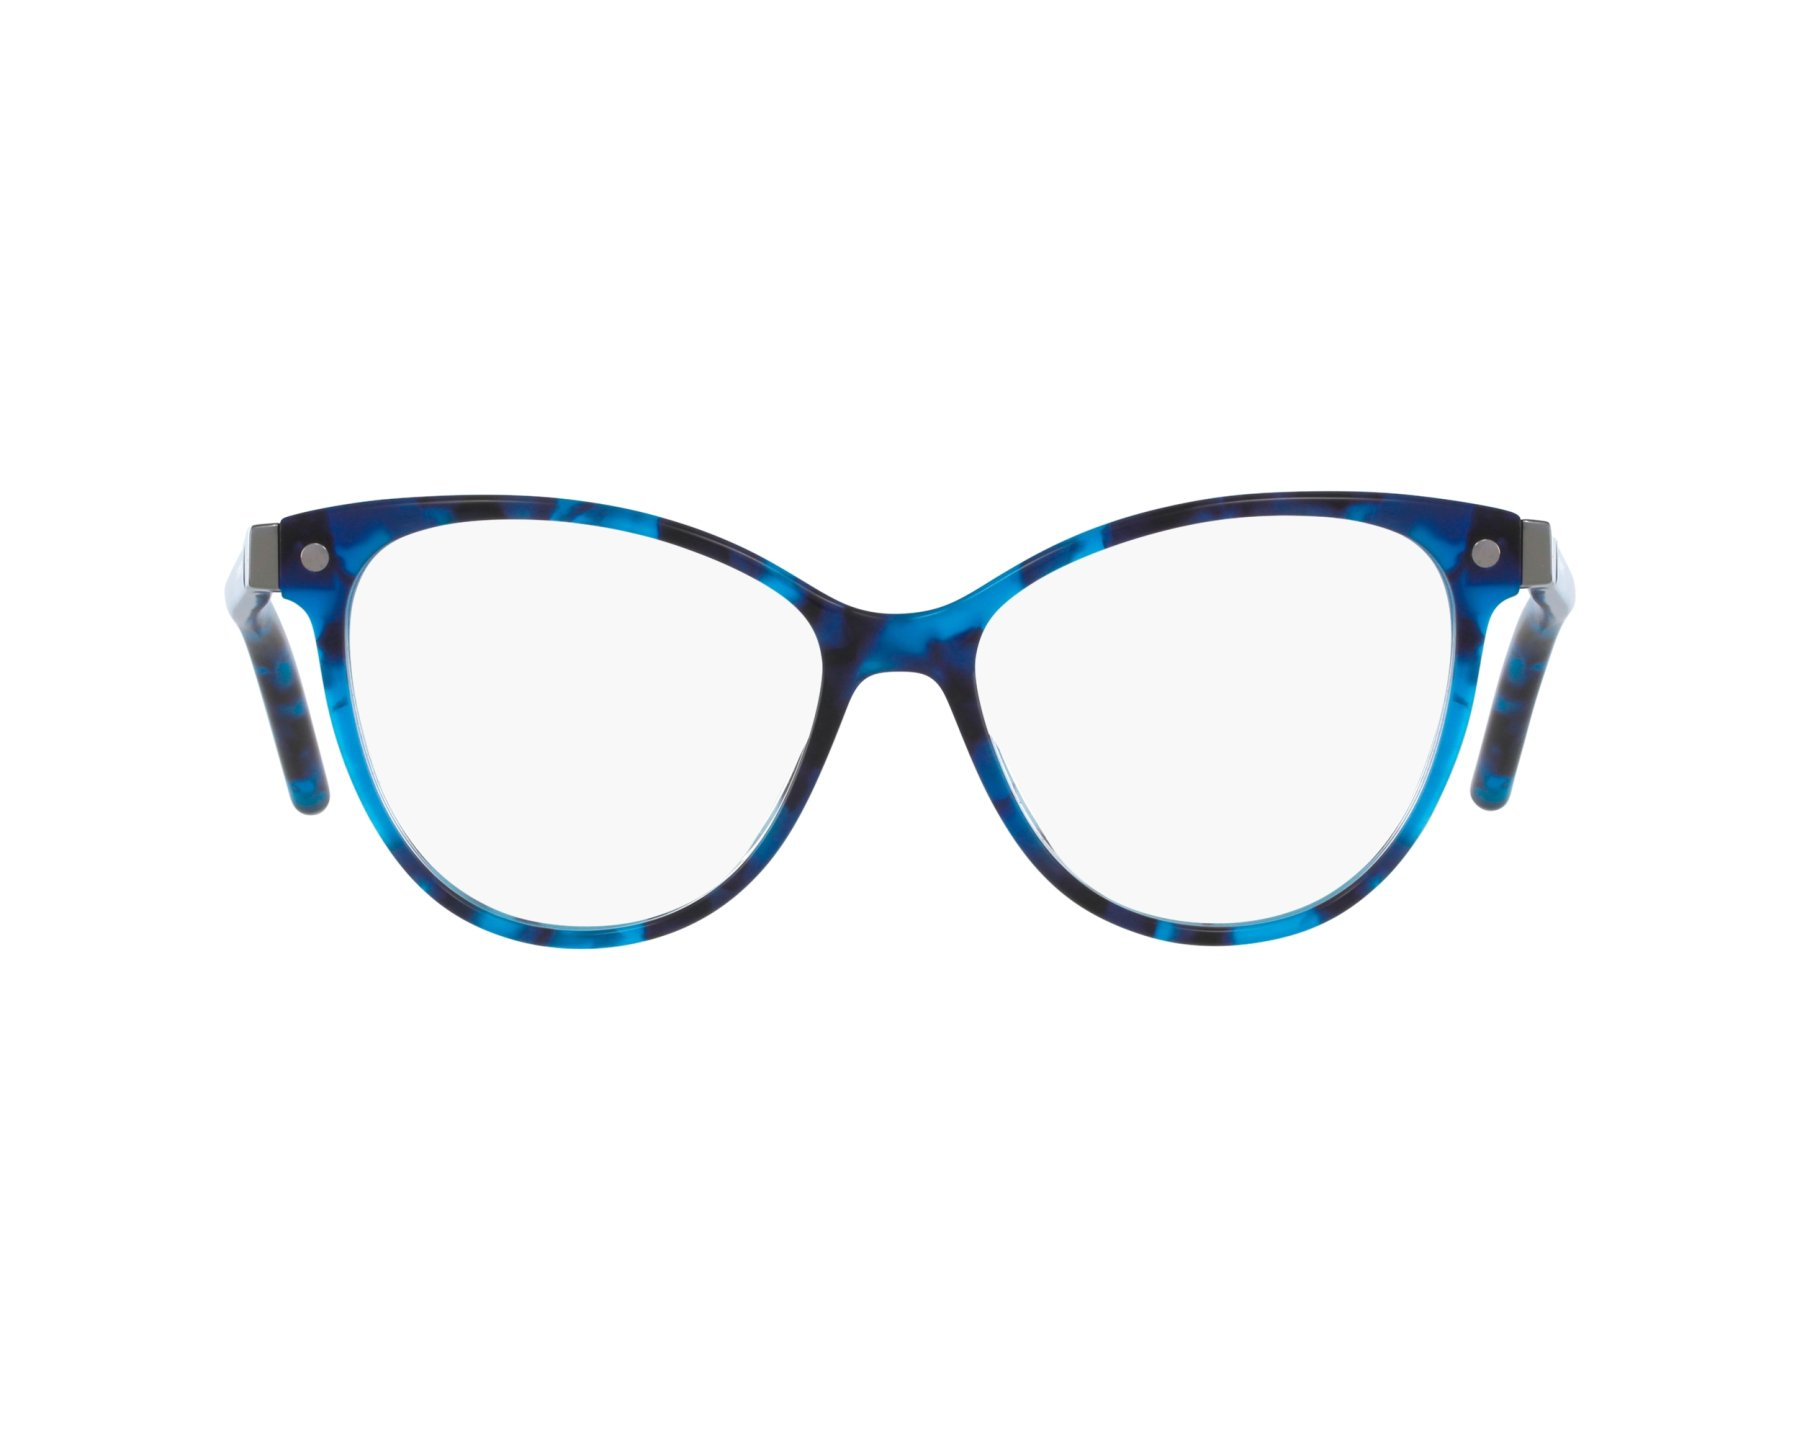 Marc Jacobs Eyeglasses Marc 20 U1t Blue Visionet